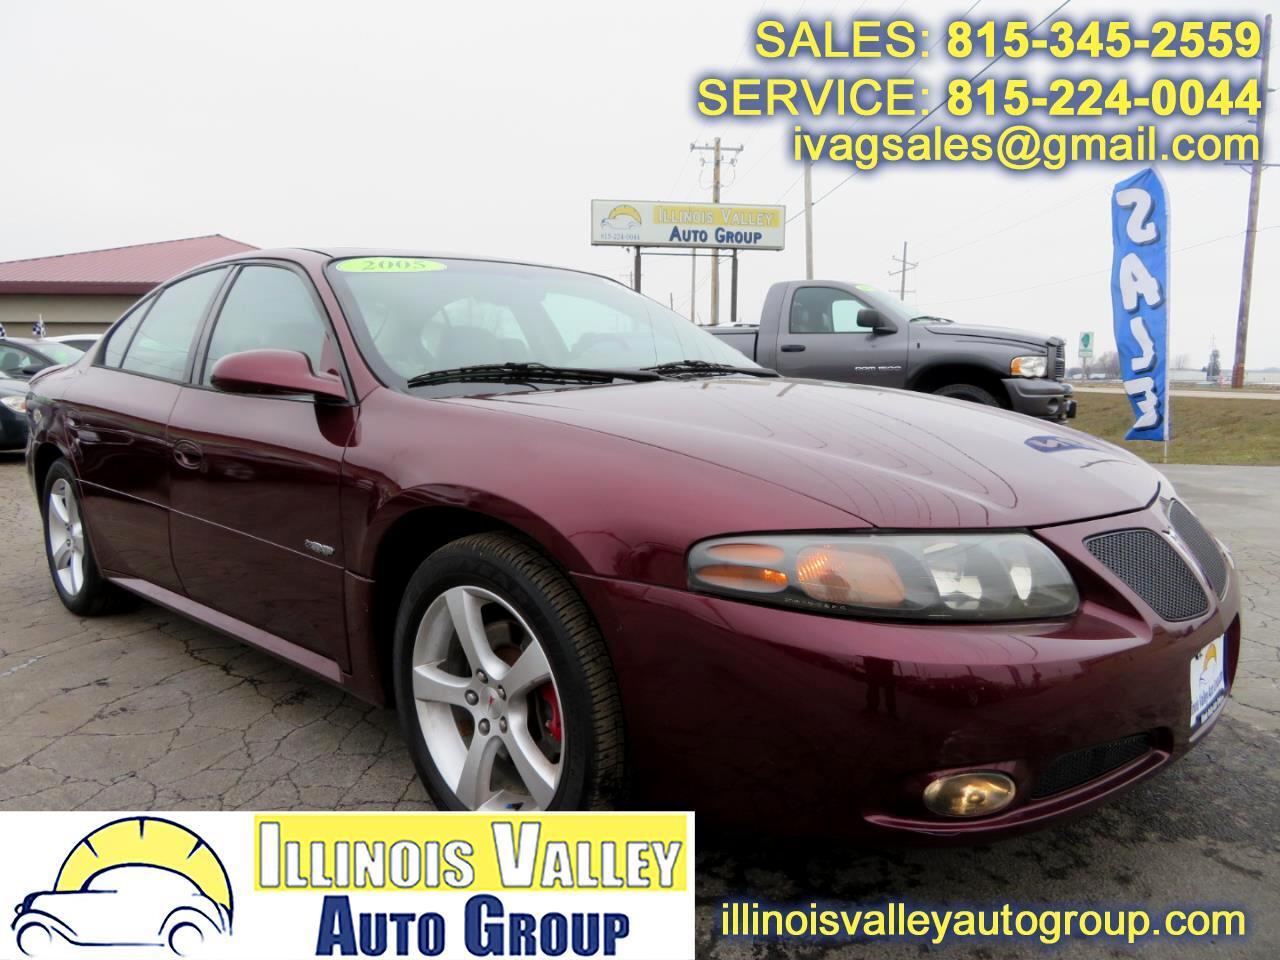 2005 Pontiac Bonneville GXP